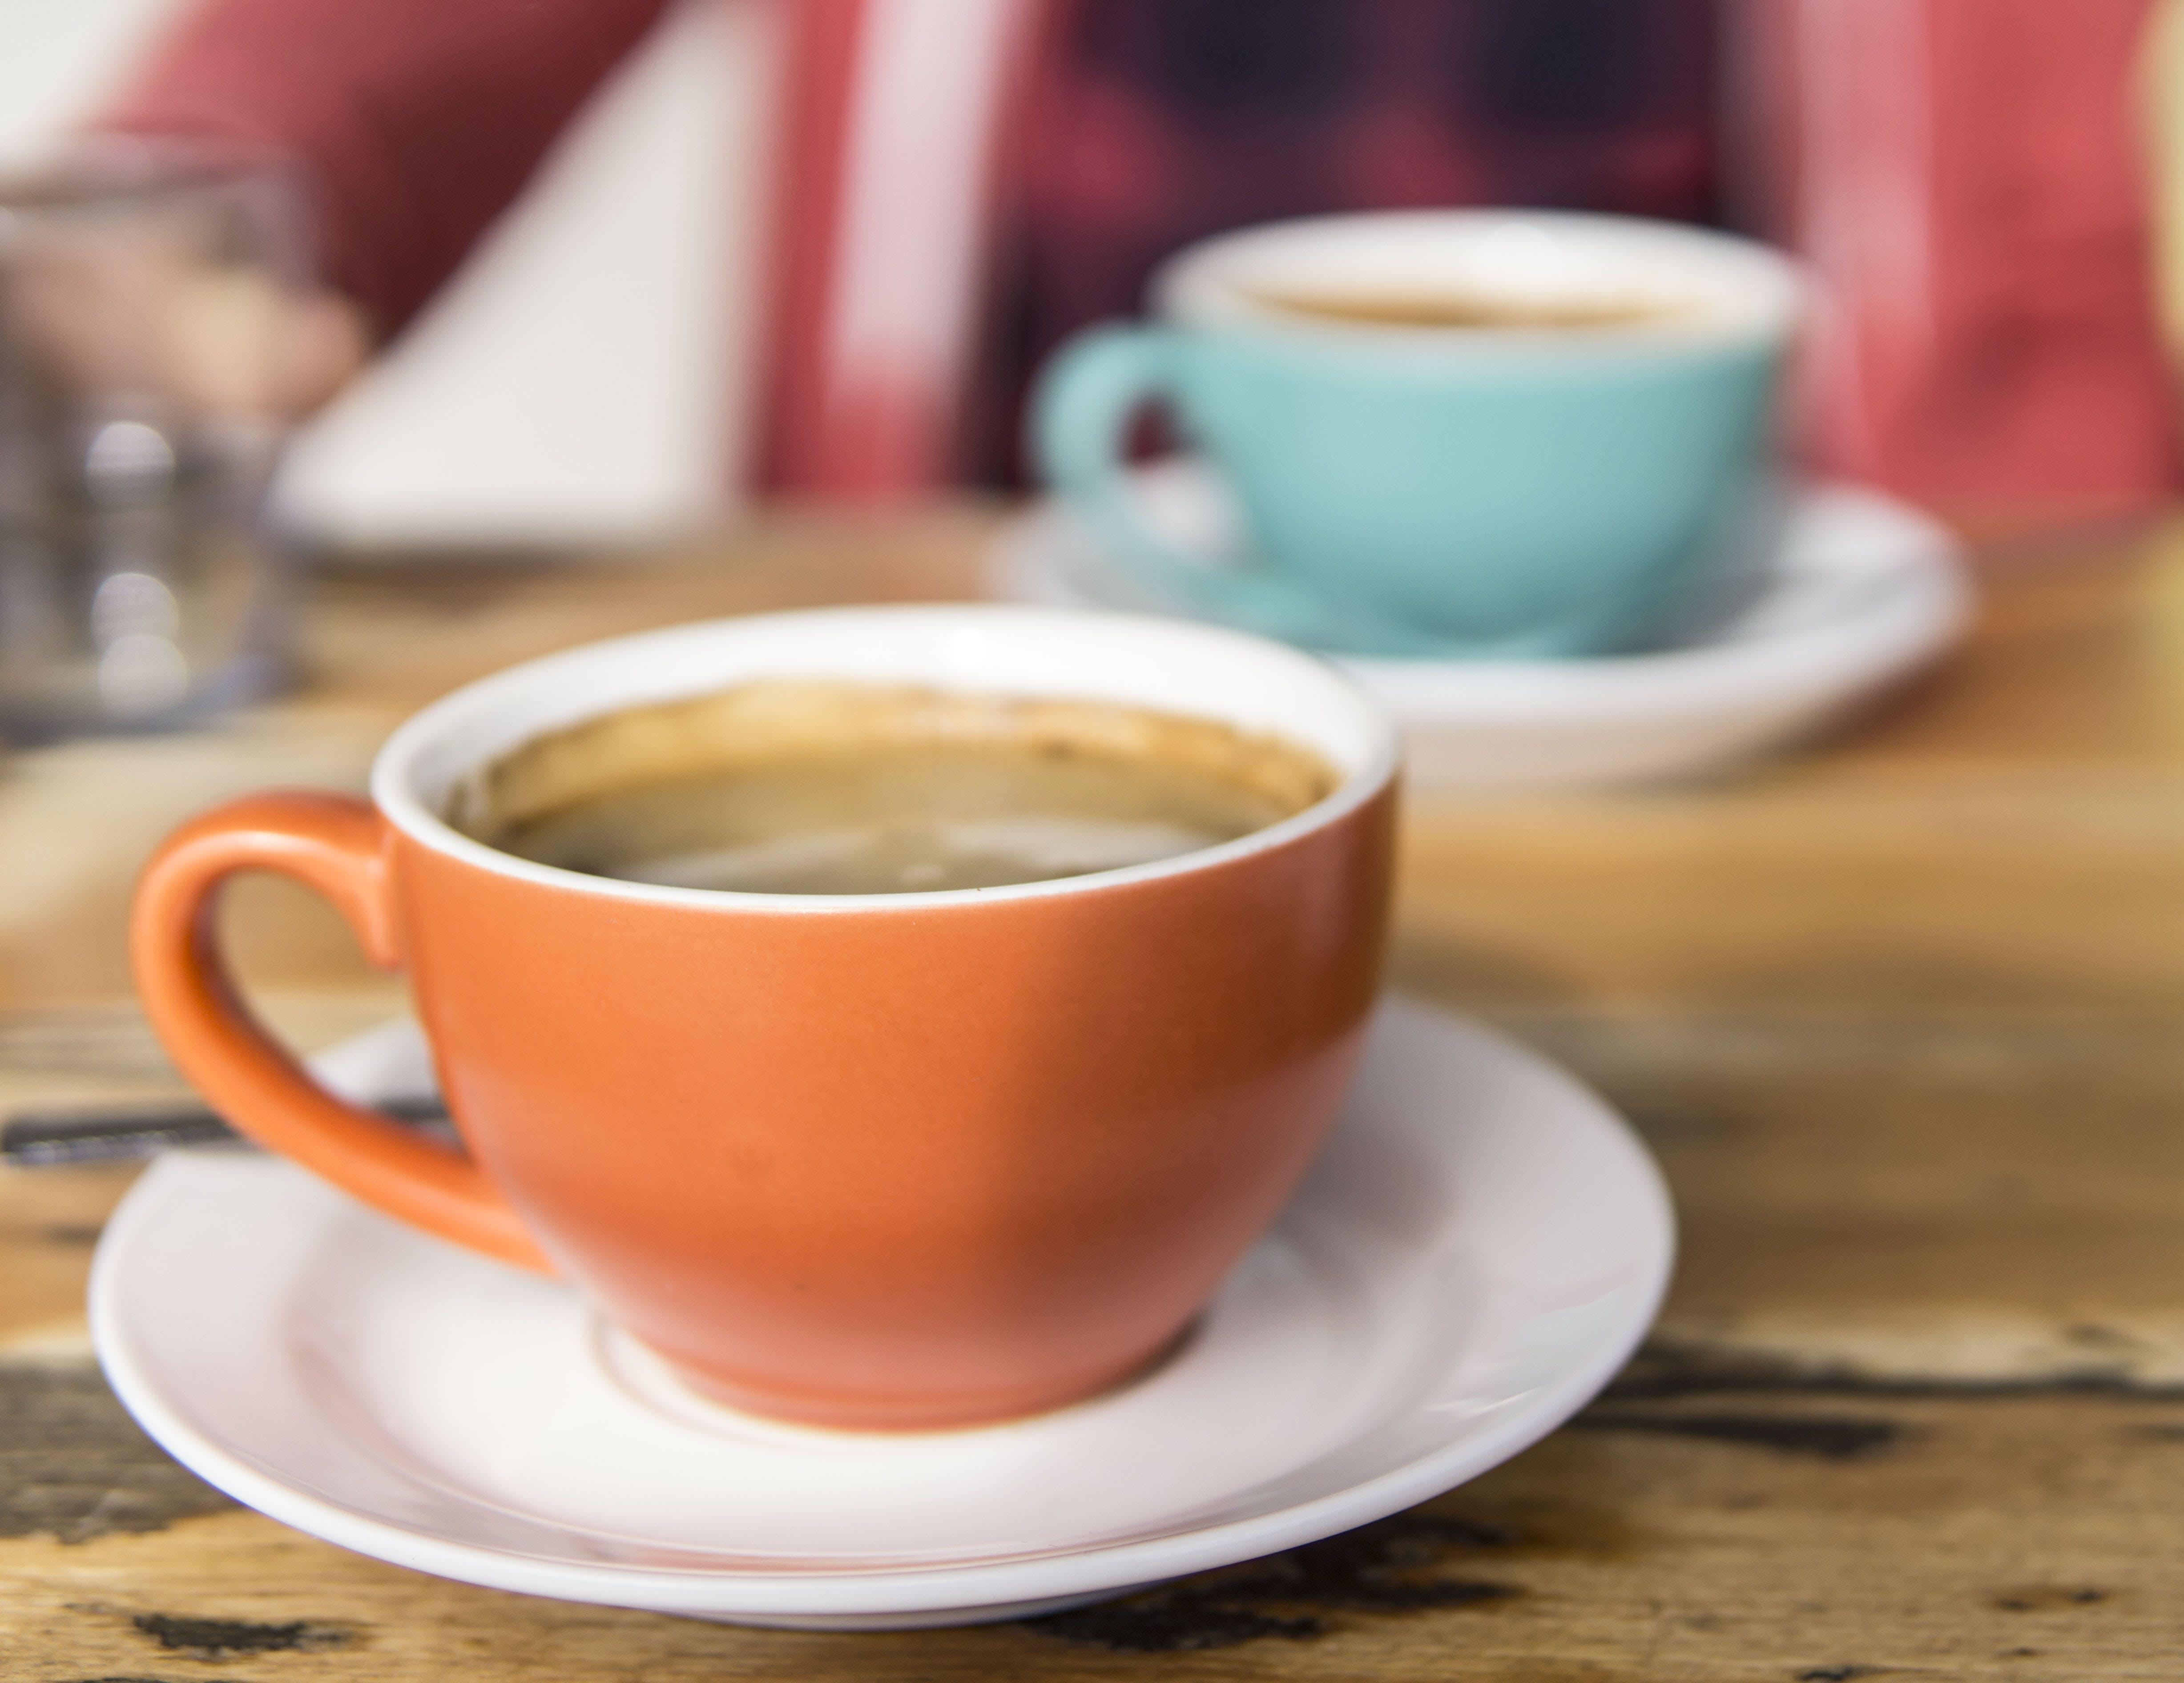 Shallow Focus Photo of Orange Ceramic Mug on White Saucer